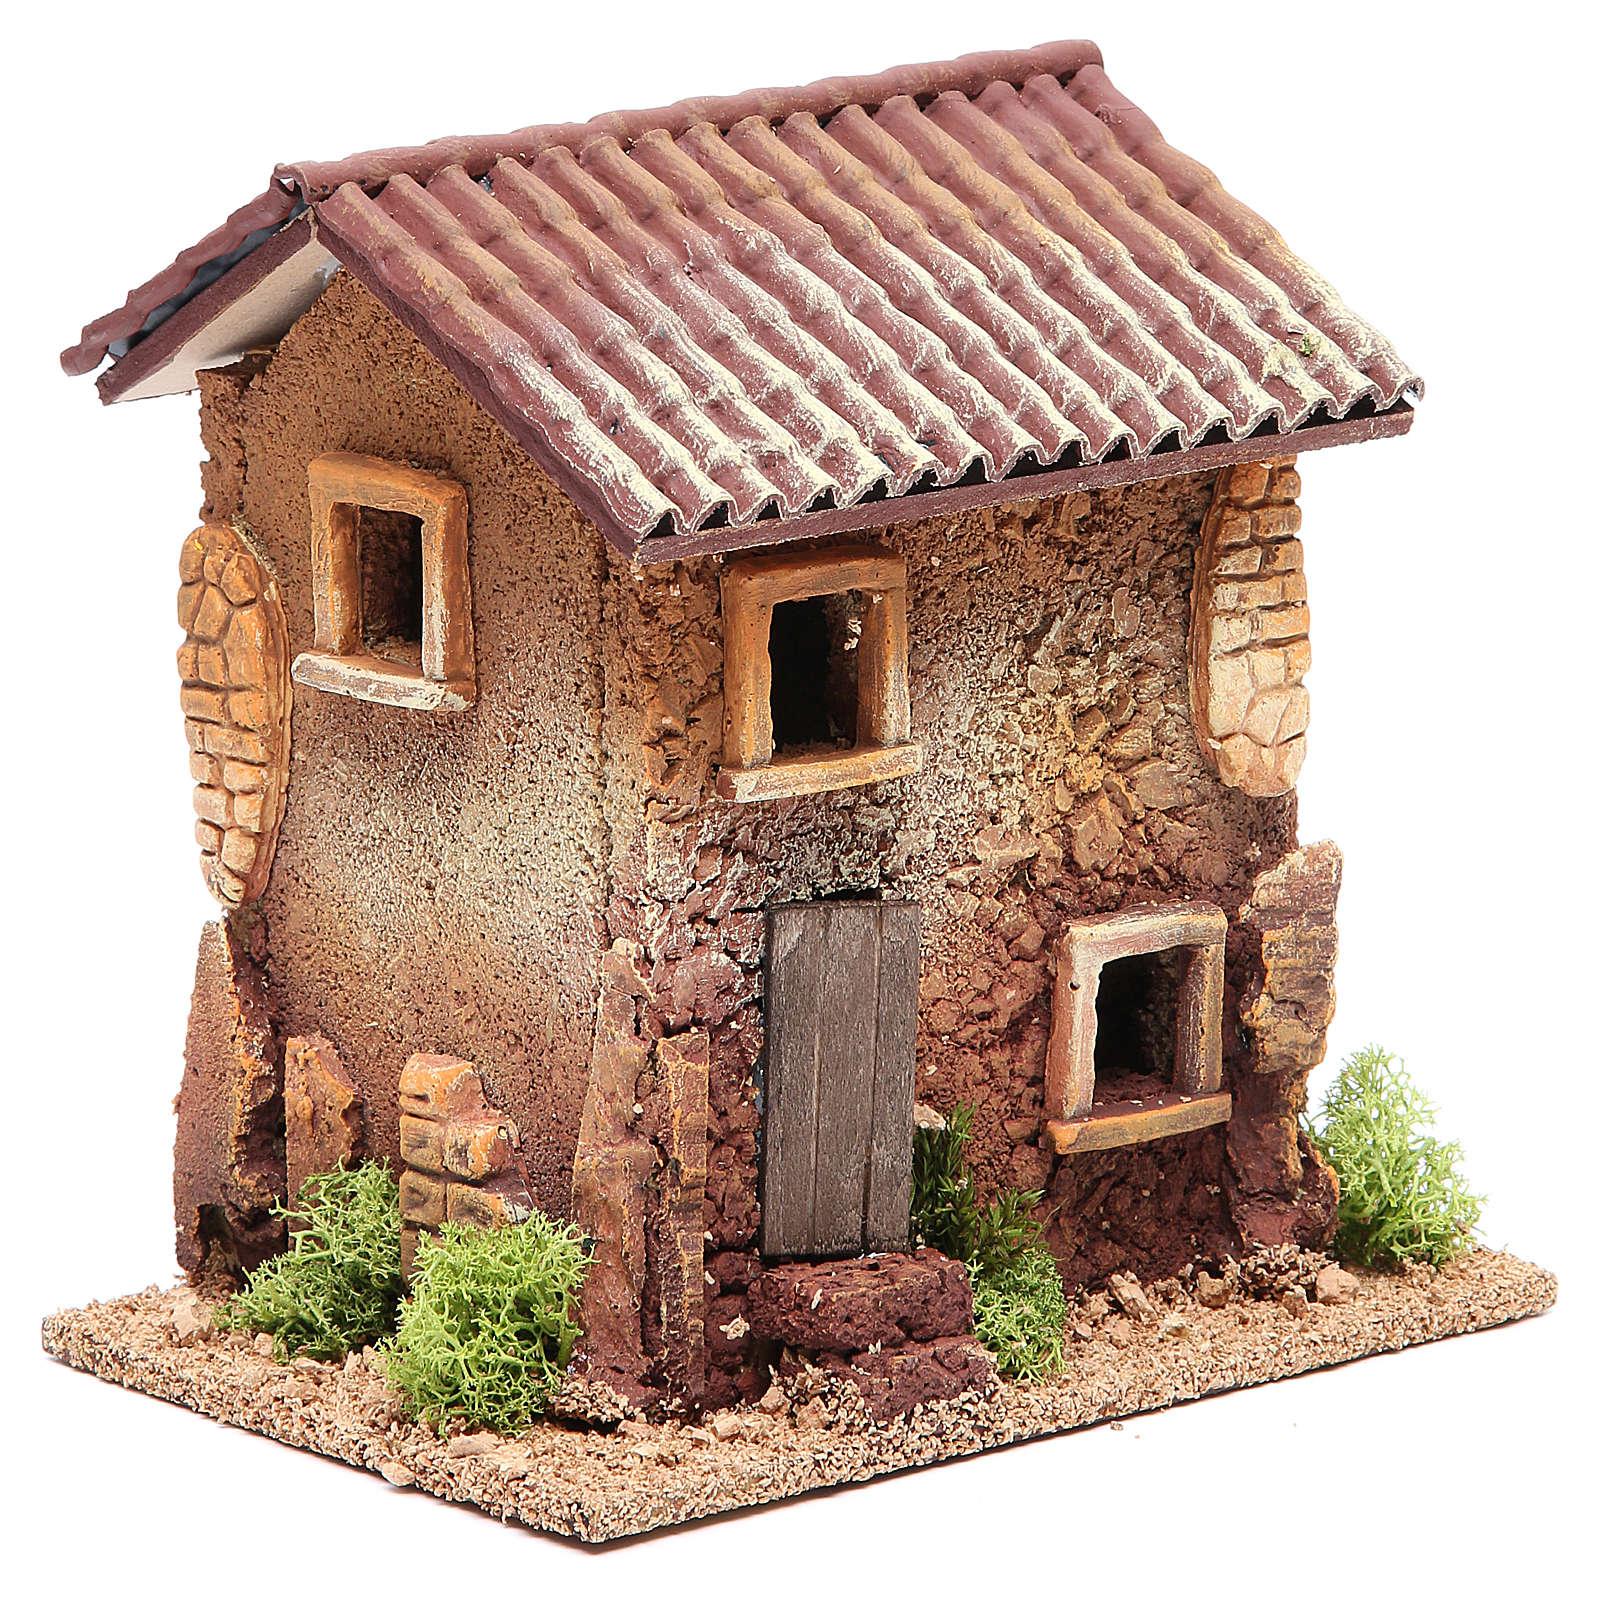 Maison crèche liège 18x18x13 cm 4